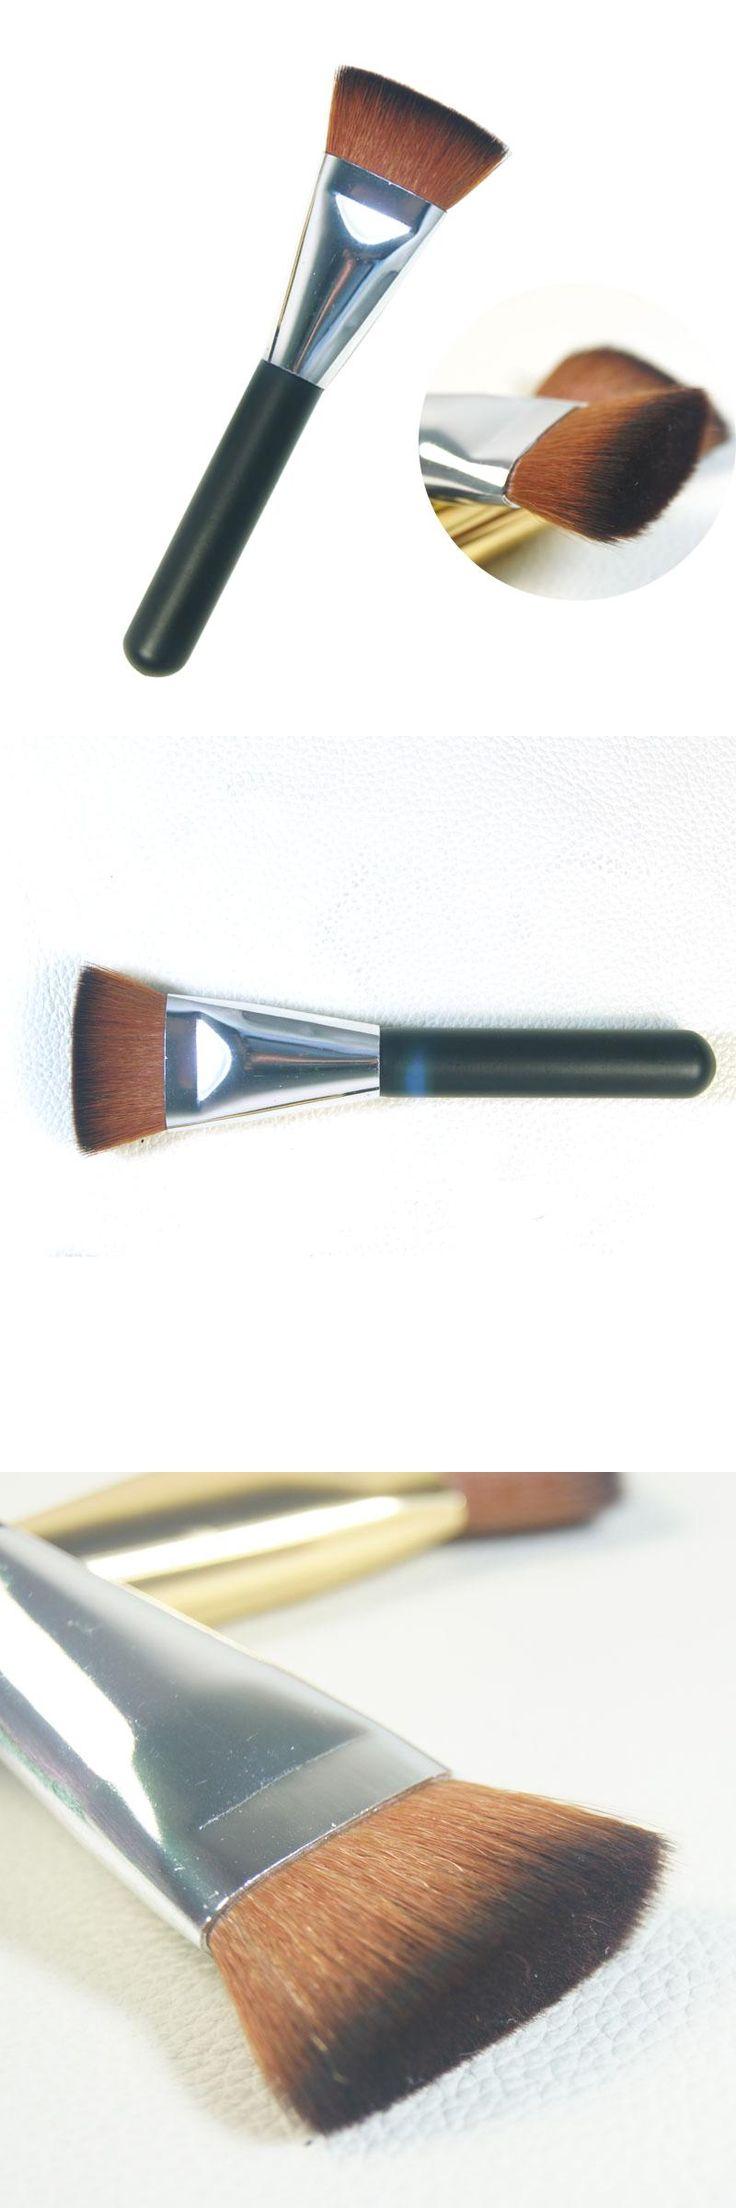 [Visit to Buy] New flat make up brush set contour powder brush set repair face brush for foundation makeup brushes tools women eyebrow blush #Advertisement